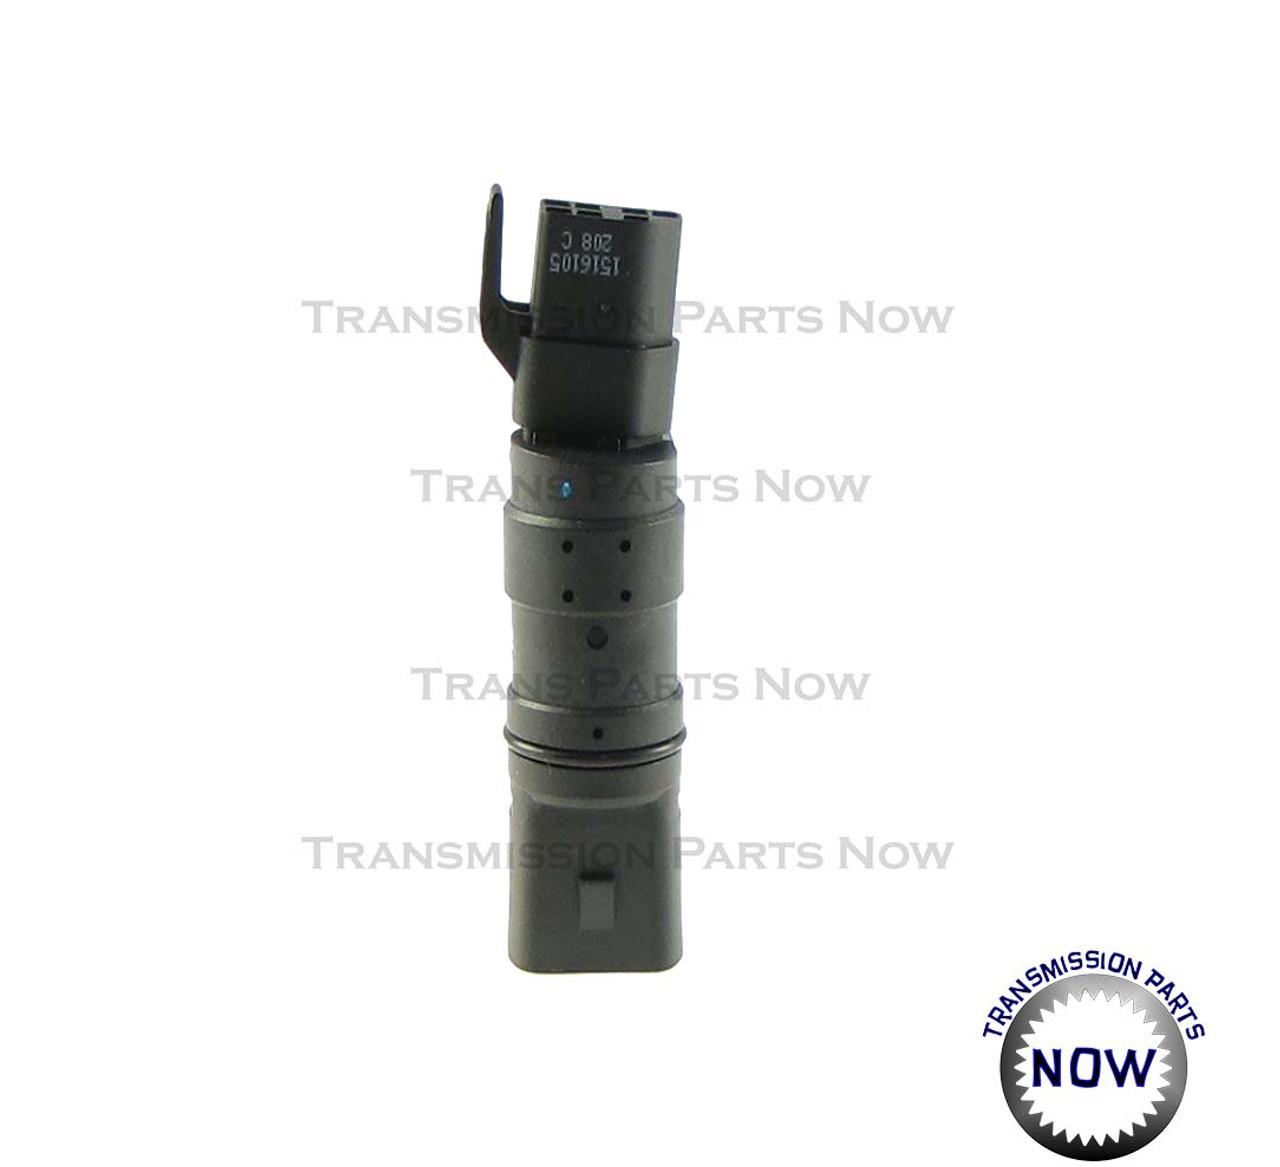 4R70W / 4R75W Case Connector 1998-2008 Hard Wire - Transmission Parts NowTransmission Parts Now